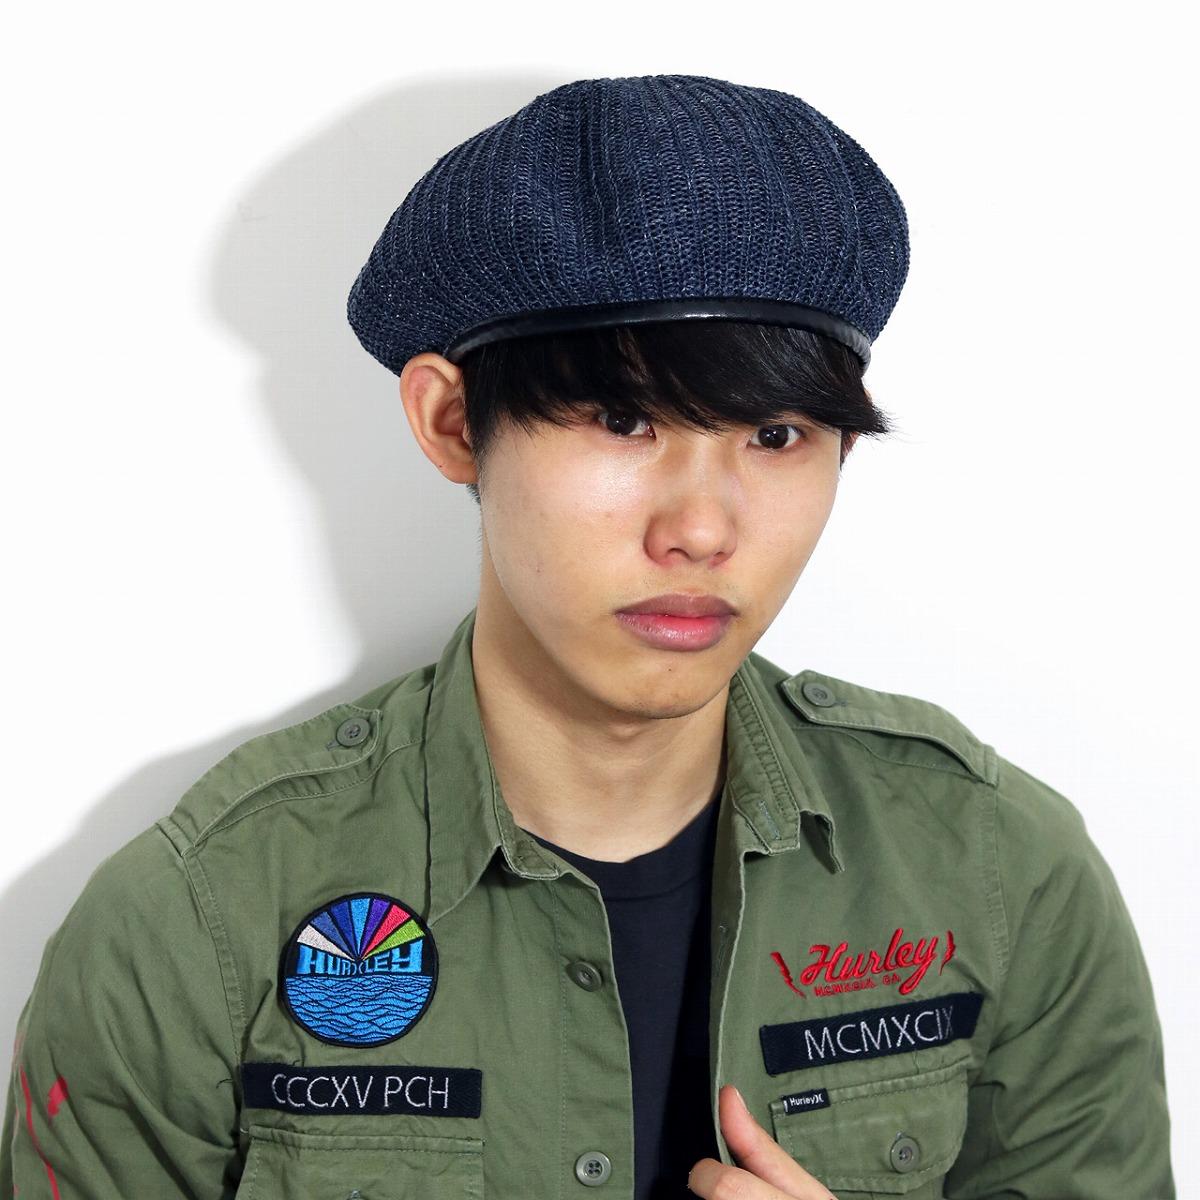 Men's beret summer knit hemp rib army beret hat summer beret Lady's beret  unisex 57 5cm army military beret Monty beret navy dark blue [beret]